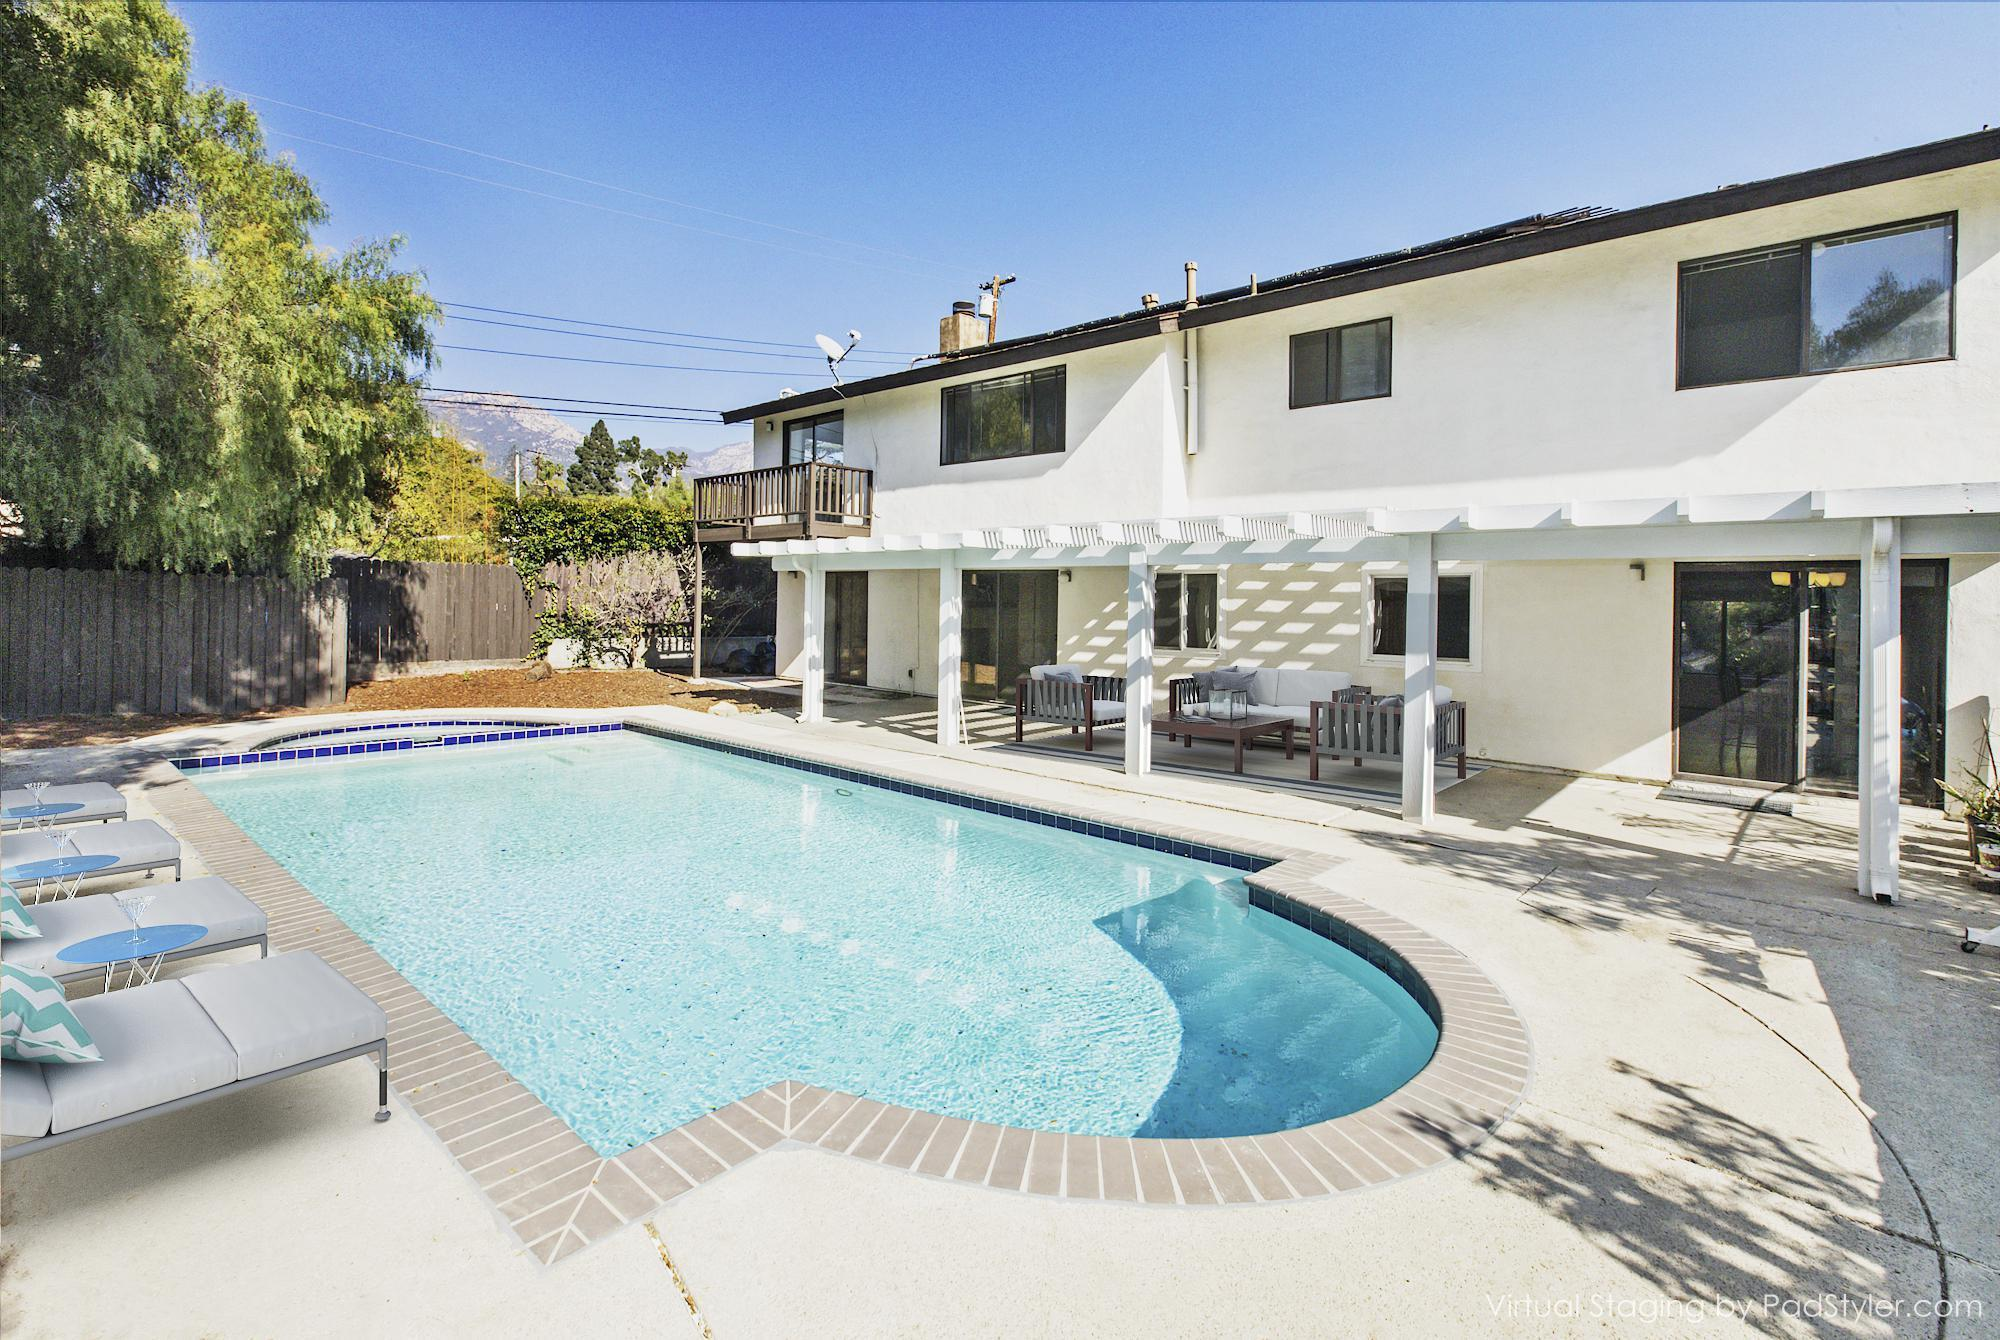 539 N Ontare Rd, Santa Barbara in Santa Barbara County, CA 93105 Home for Sale